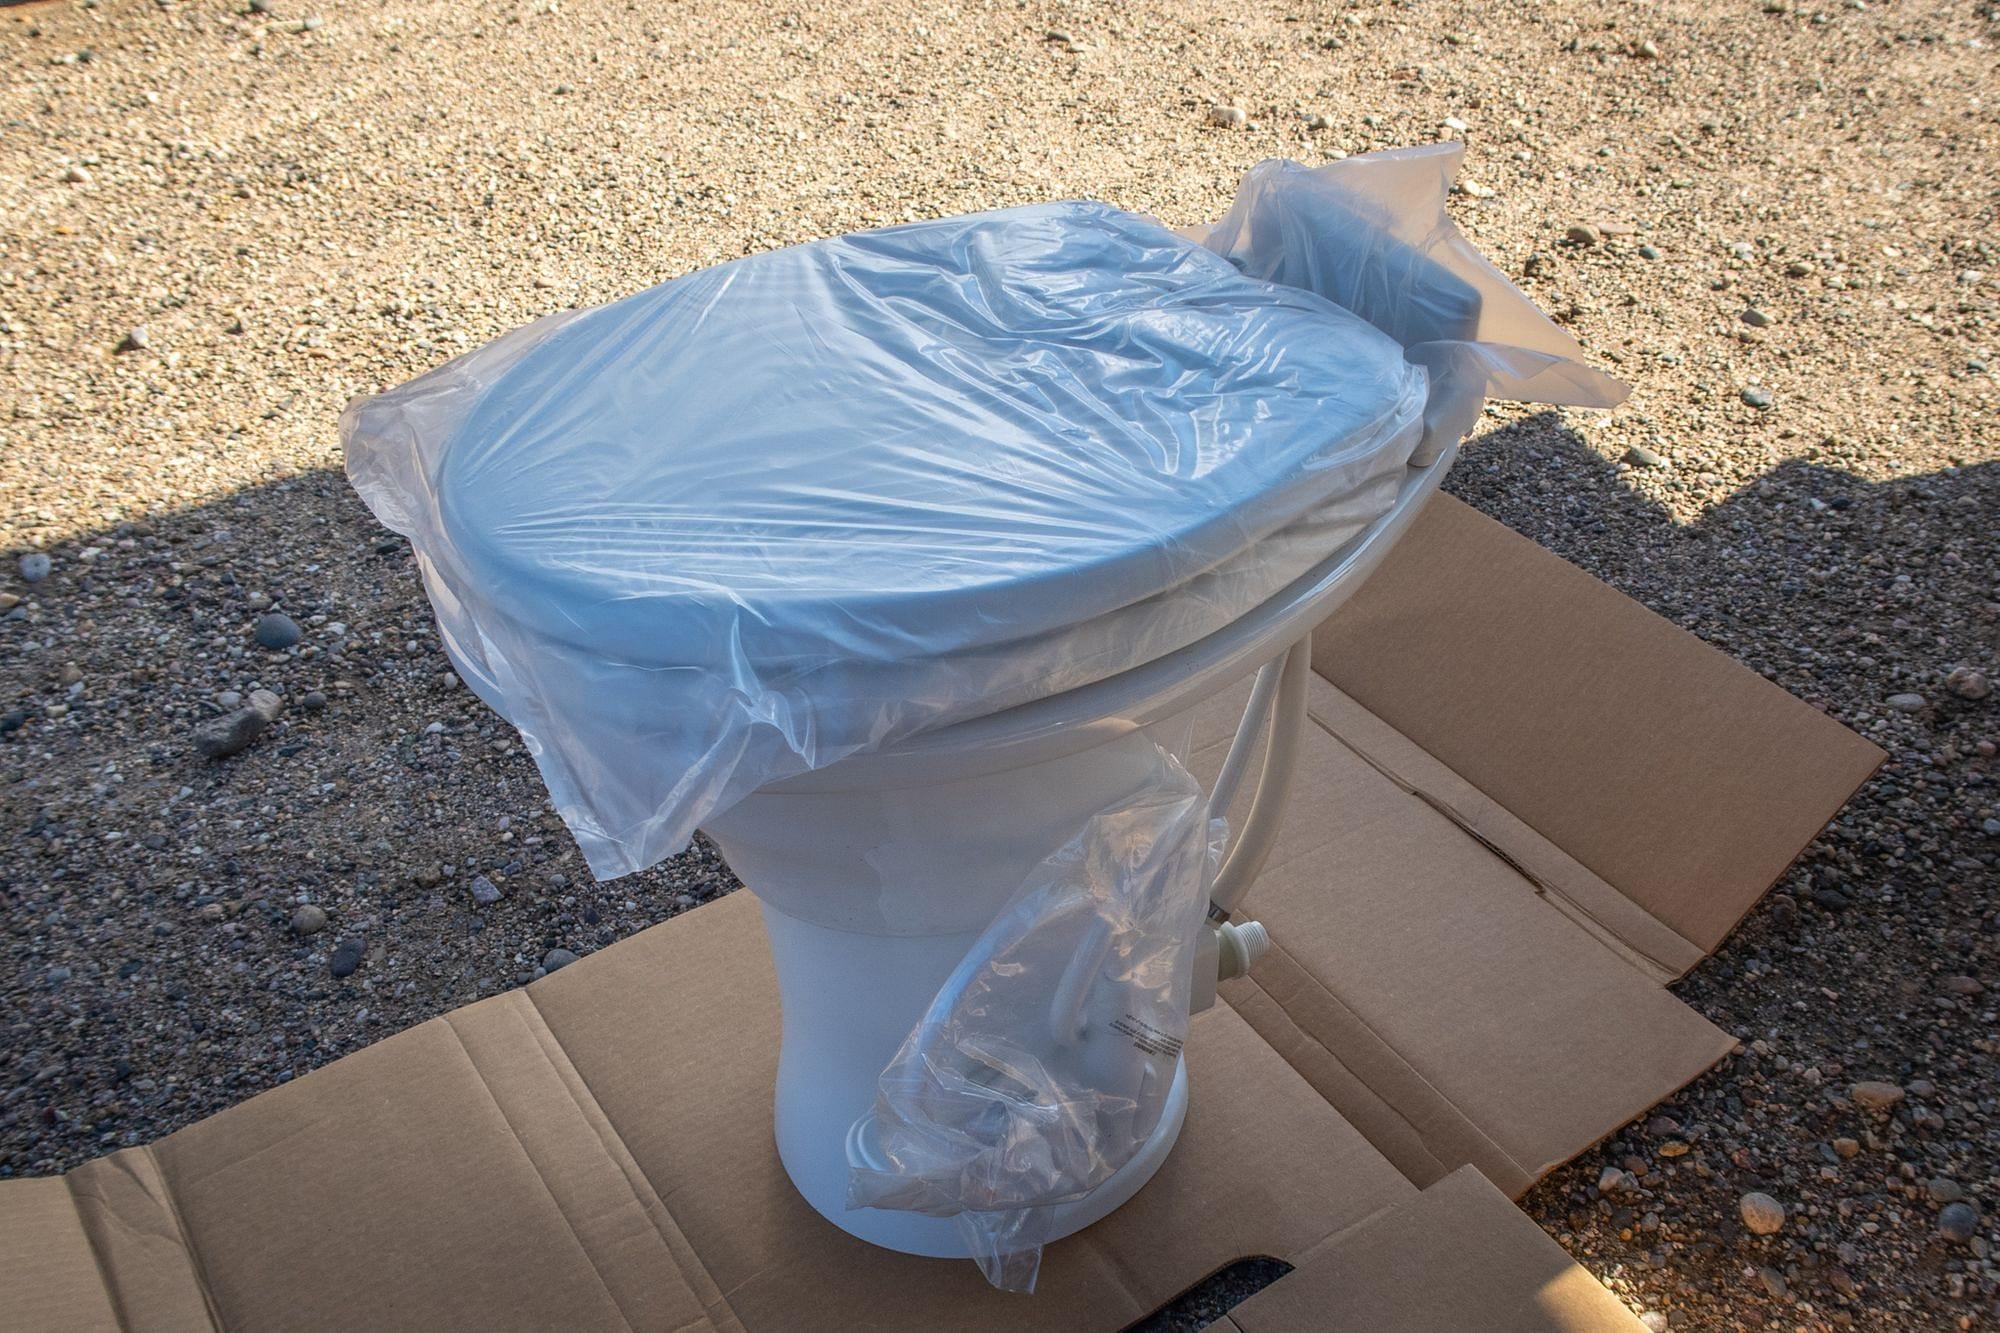 Inspecting RV Toilet